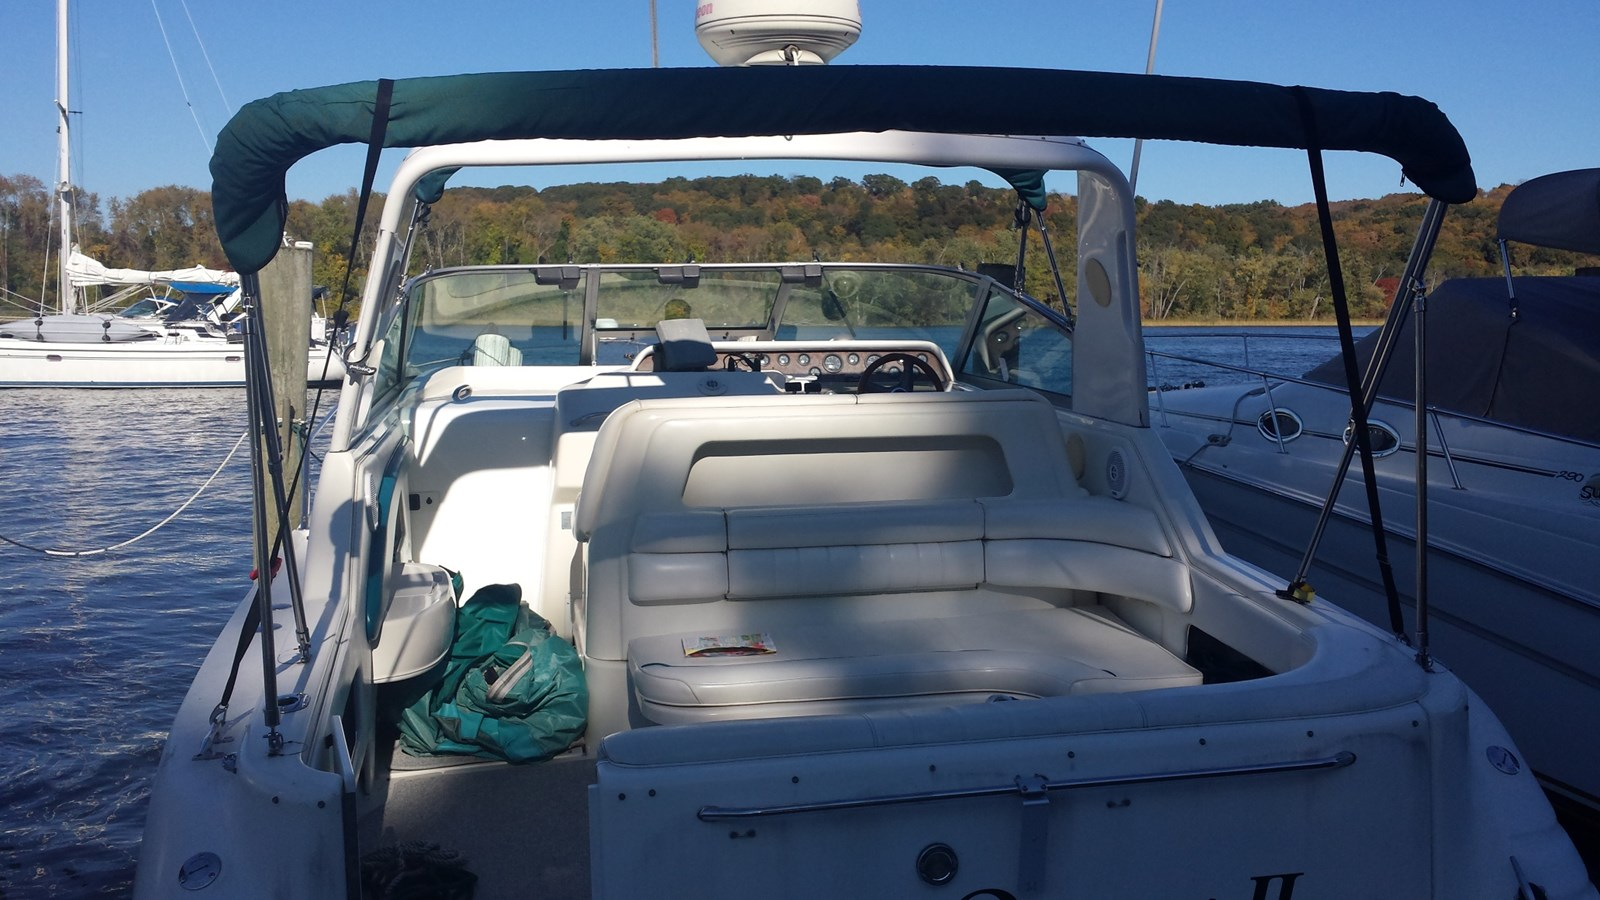 20141012_150605_resized 1996 SEA RAY 300 Sundancer Cruiser 2821822